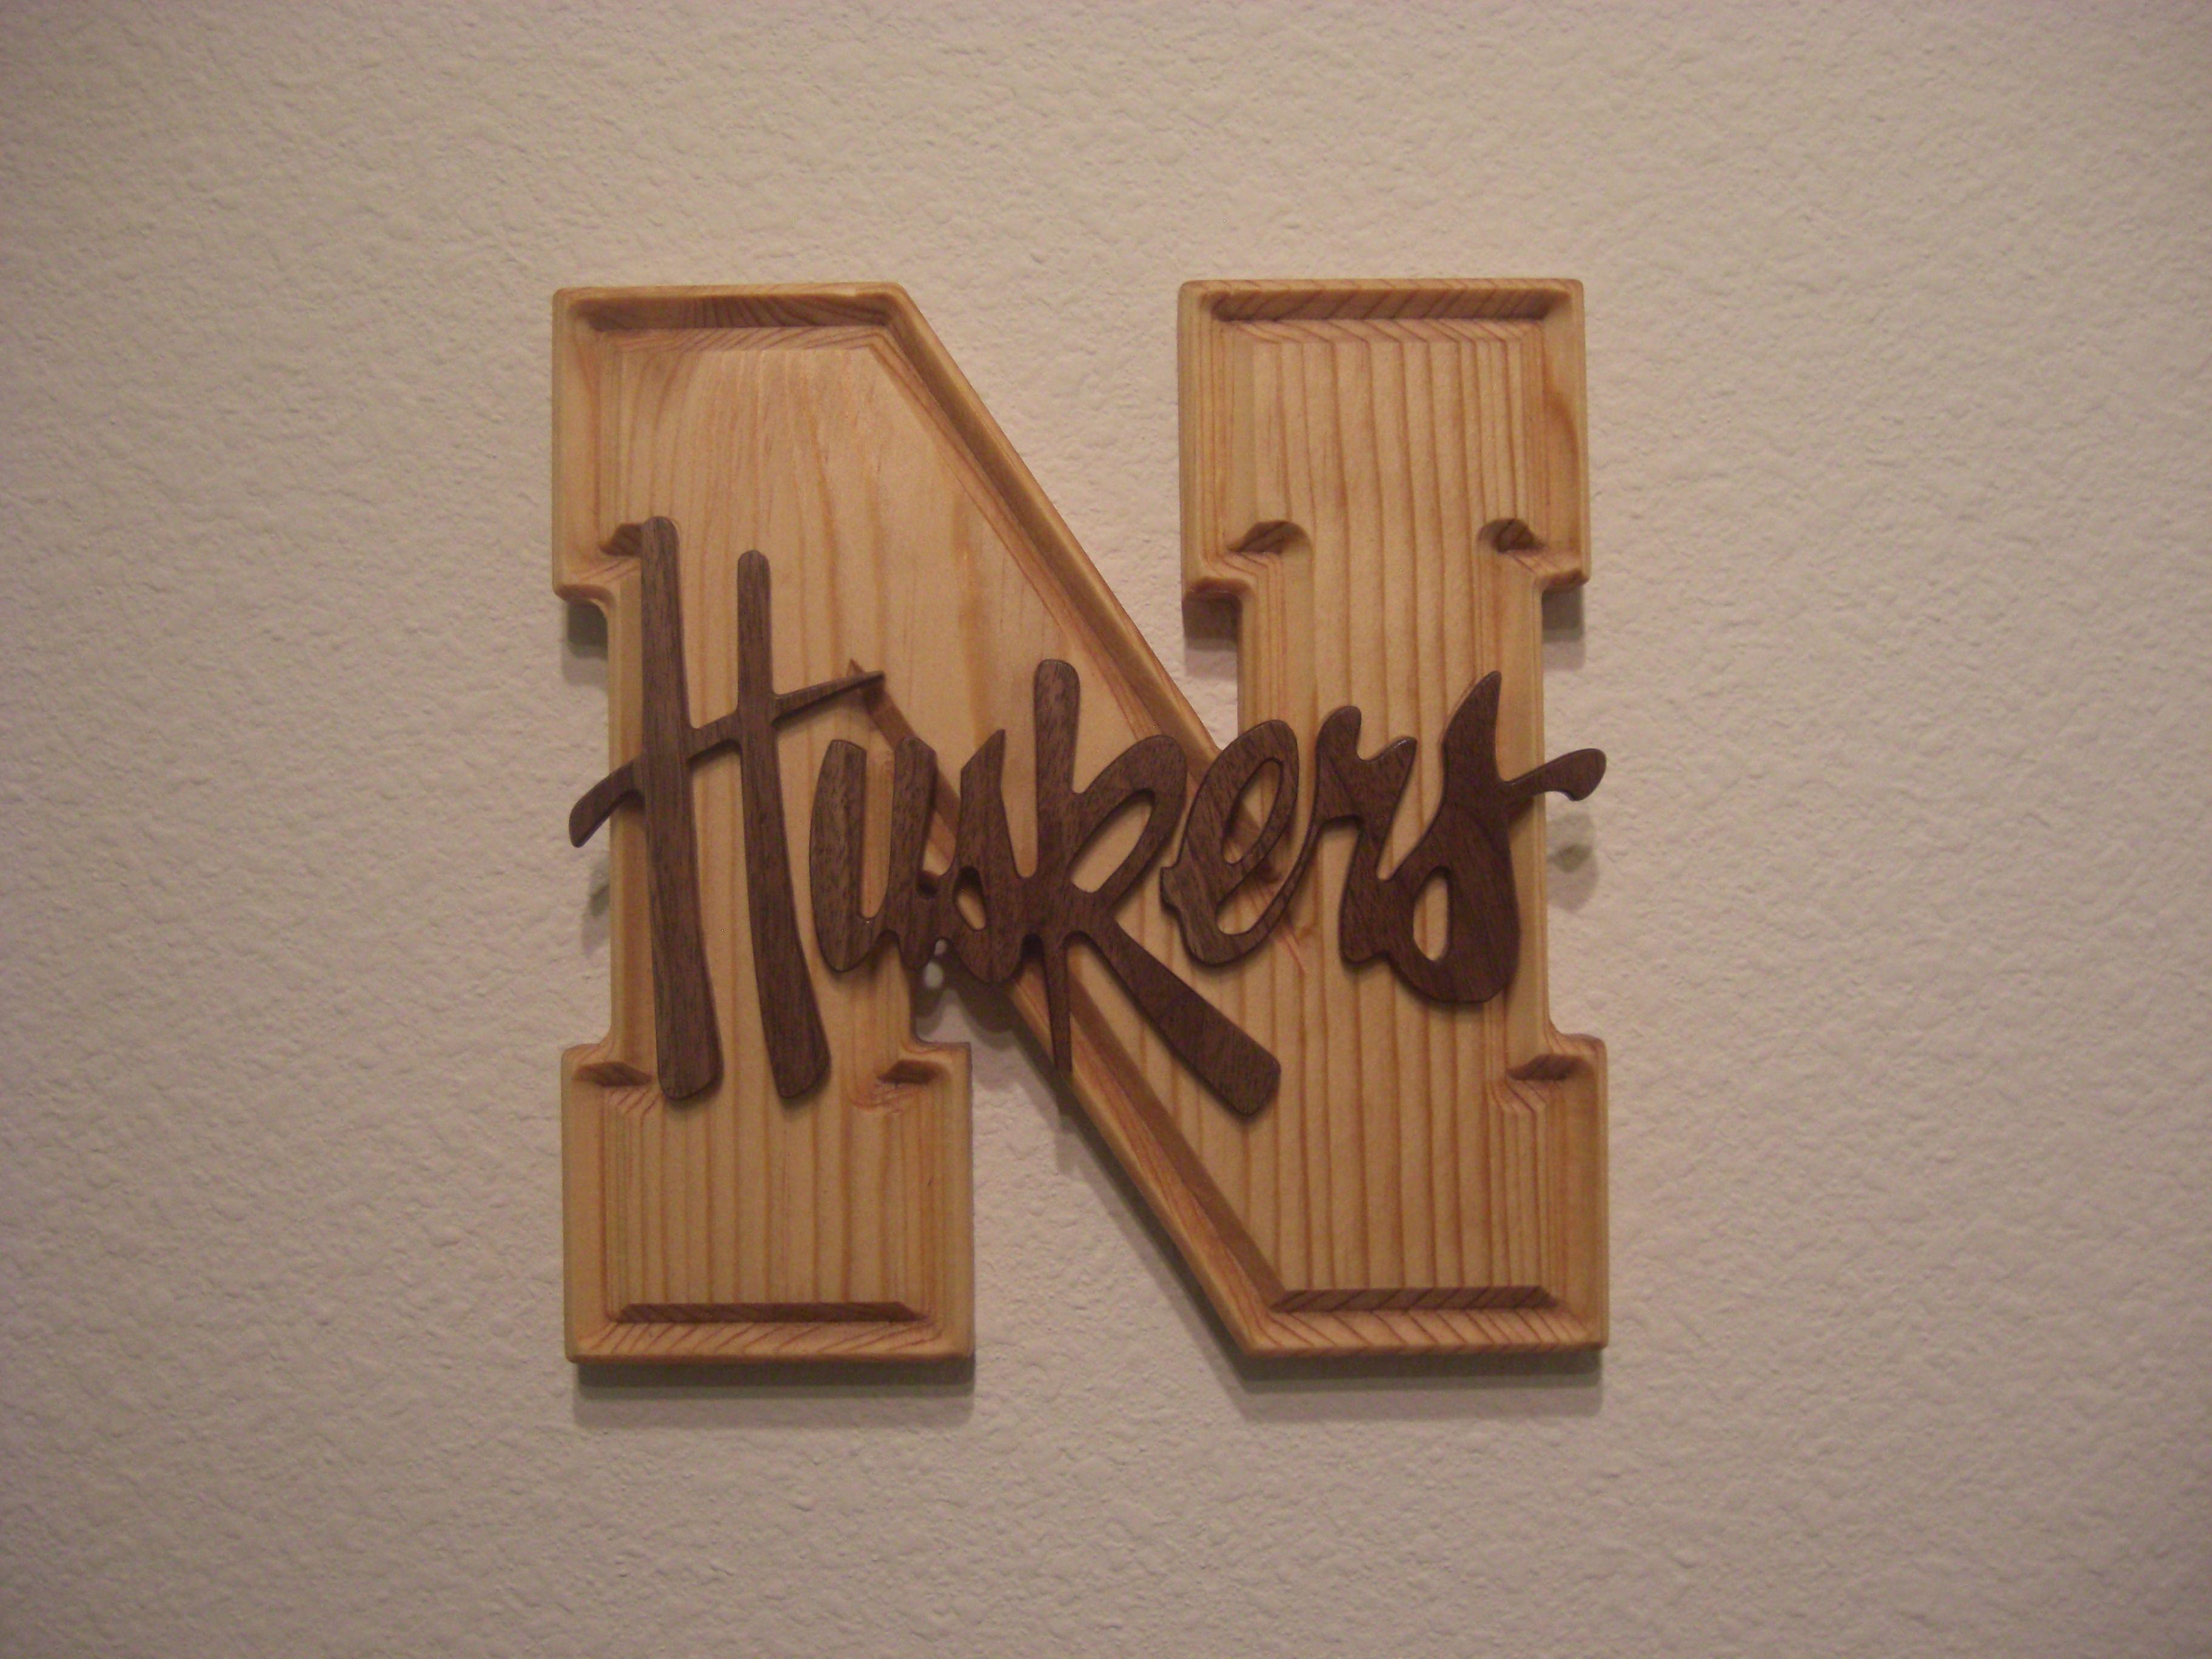 Nebraska Husker Sign Wood Signs Nebraska Huskers Wood Wall Art